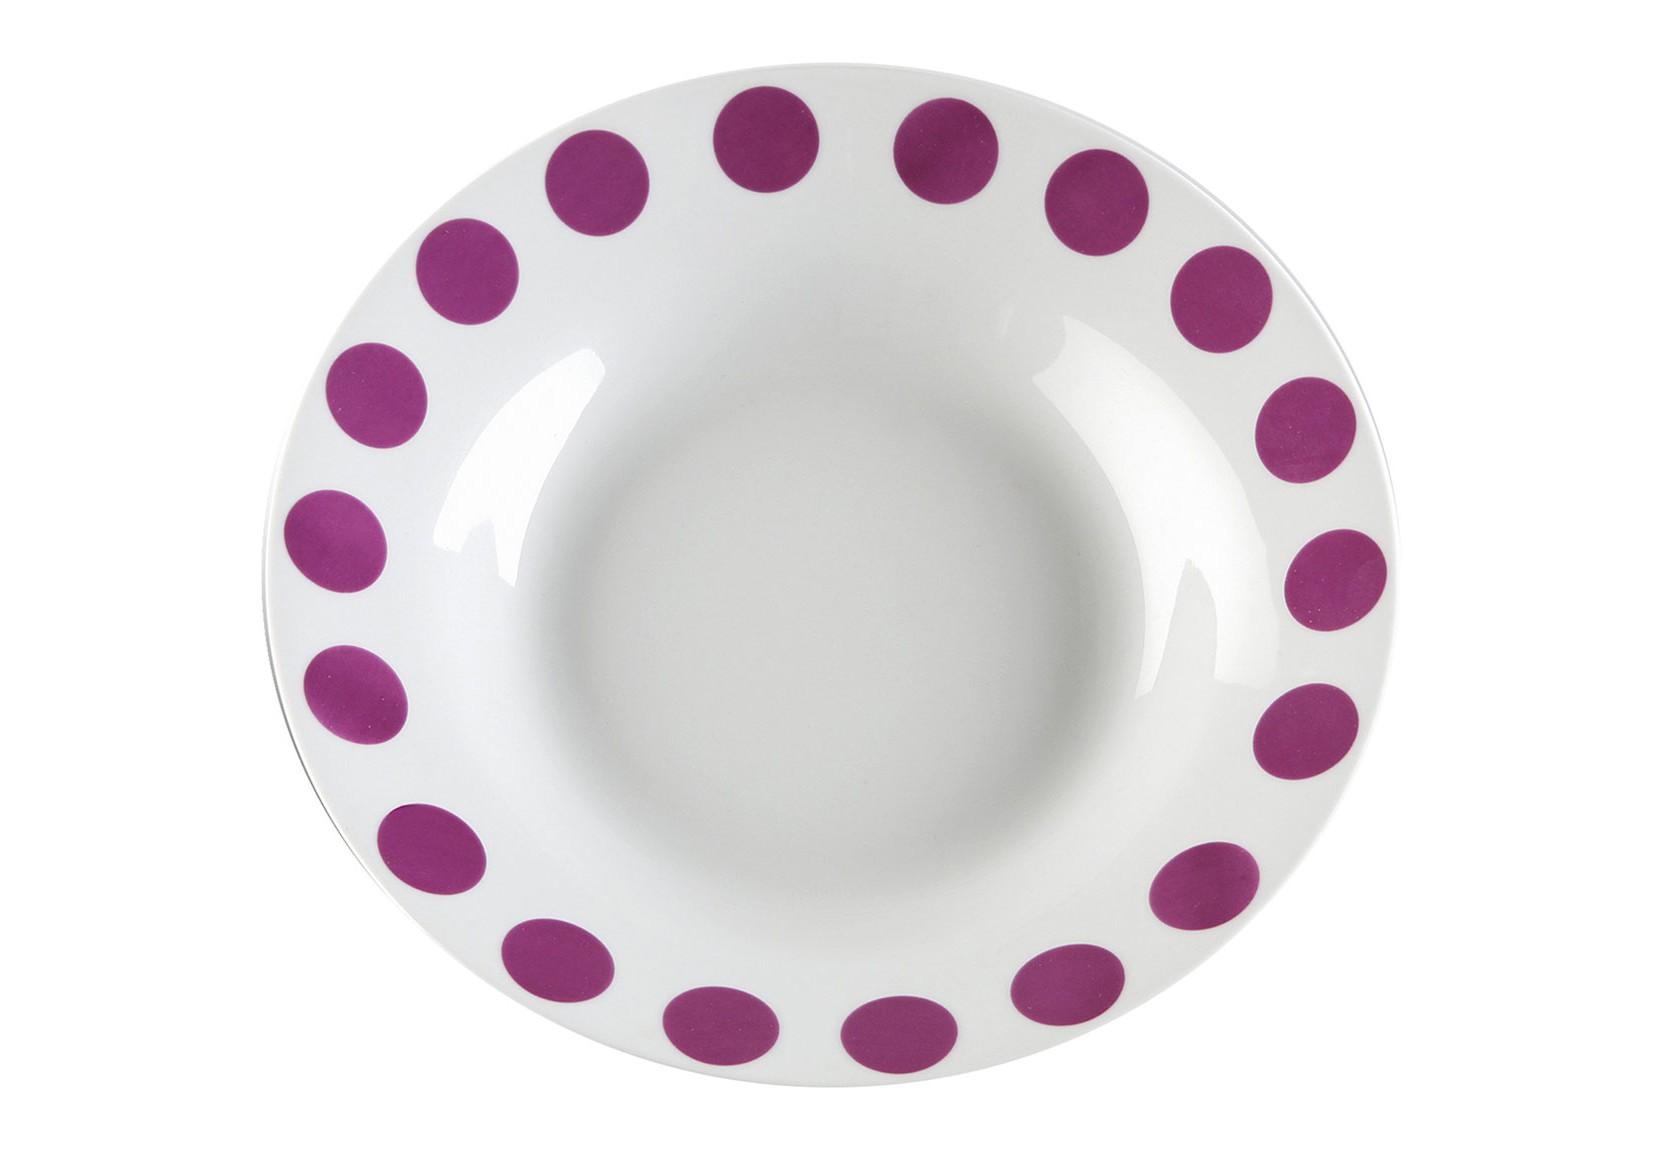 Набор из глубоких тарелок (6шт)Тарелки<br><br><br>Material: Фарфор<br>Length см: 23<br>Width см: 23<br>Height см: 4